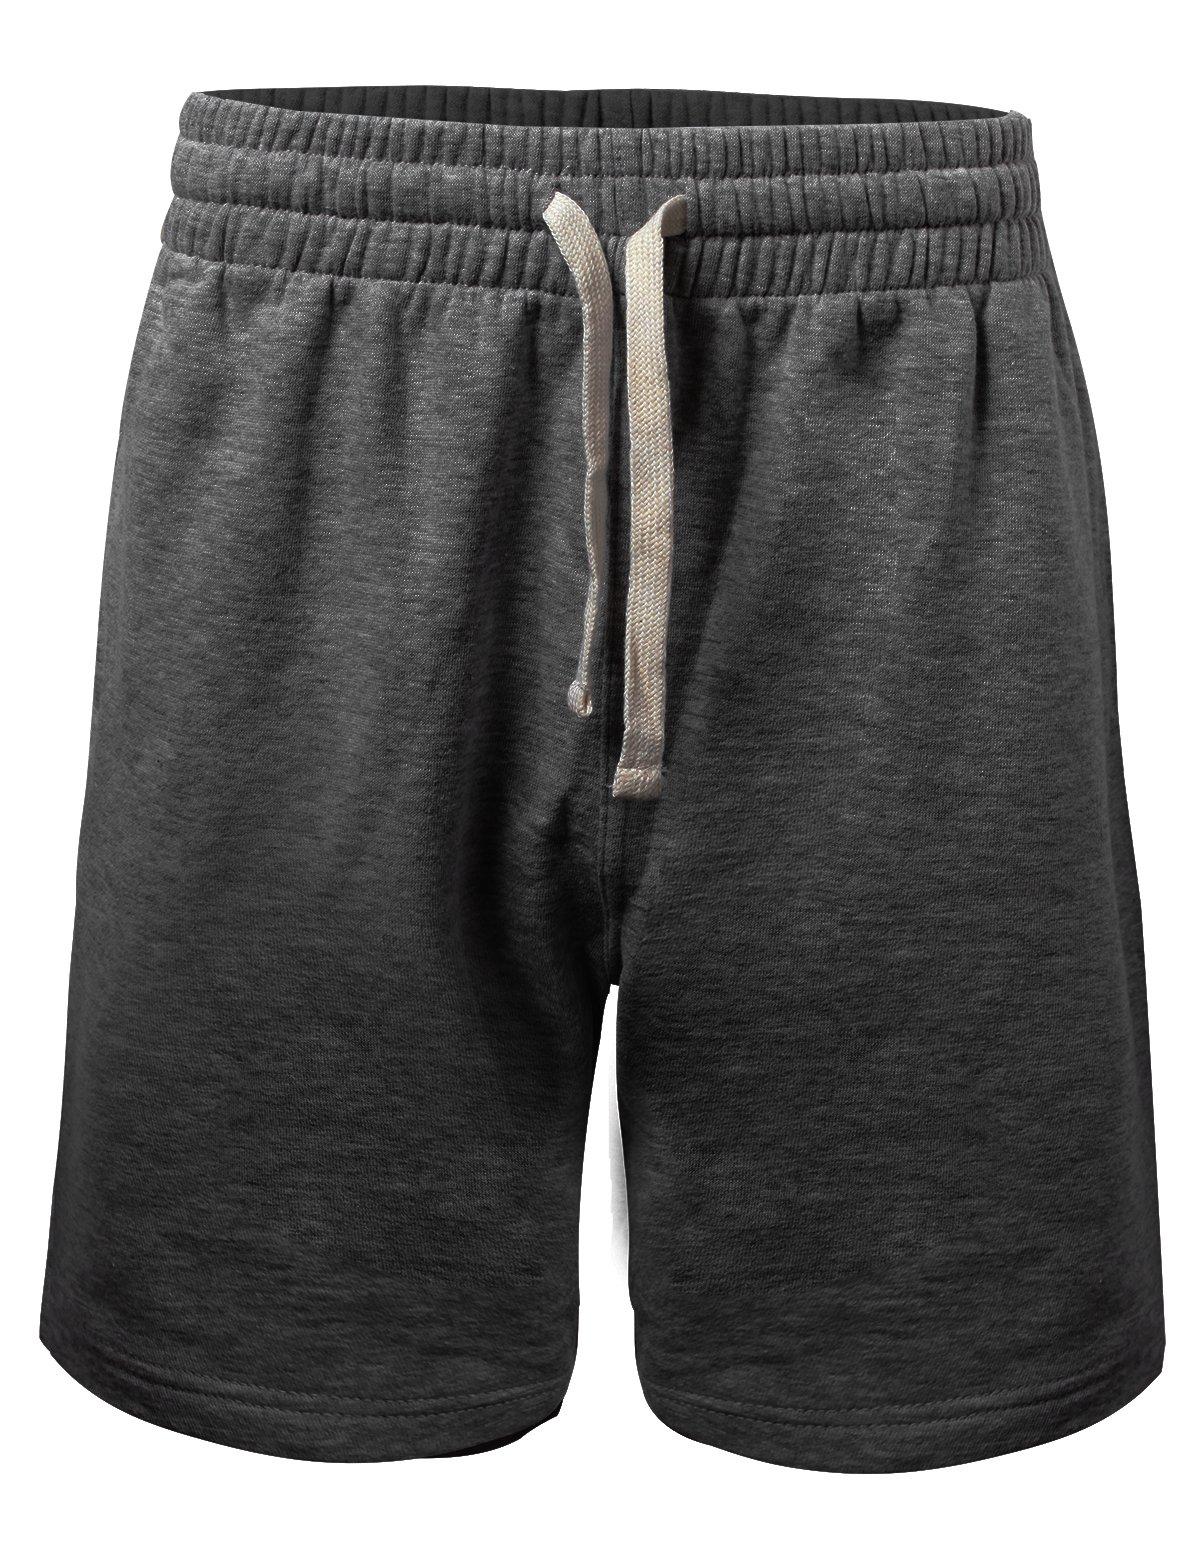 ProGo Men's Casual Basic Fleece Marled Shorts Pants with Elastic Waist (Charcoal, X-Small)